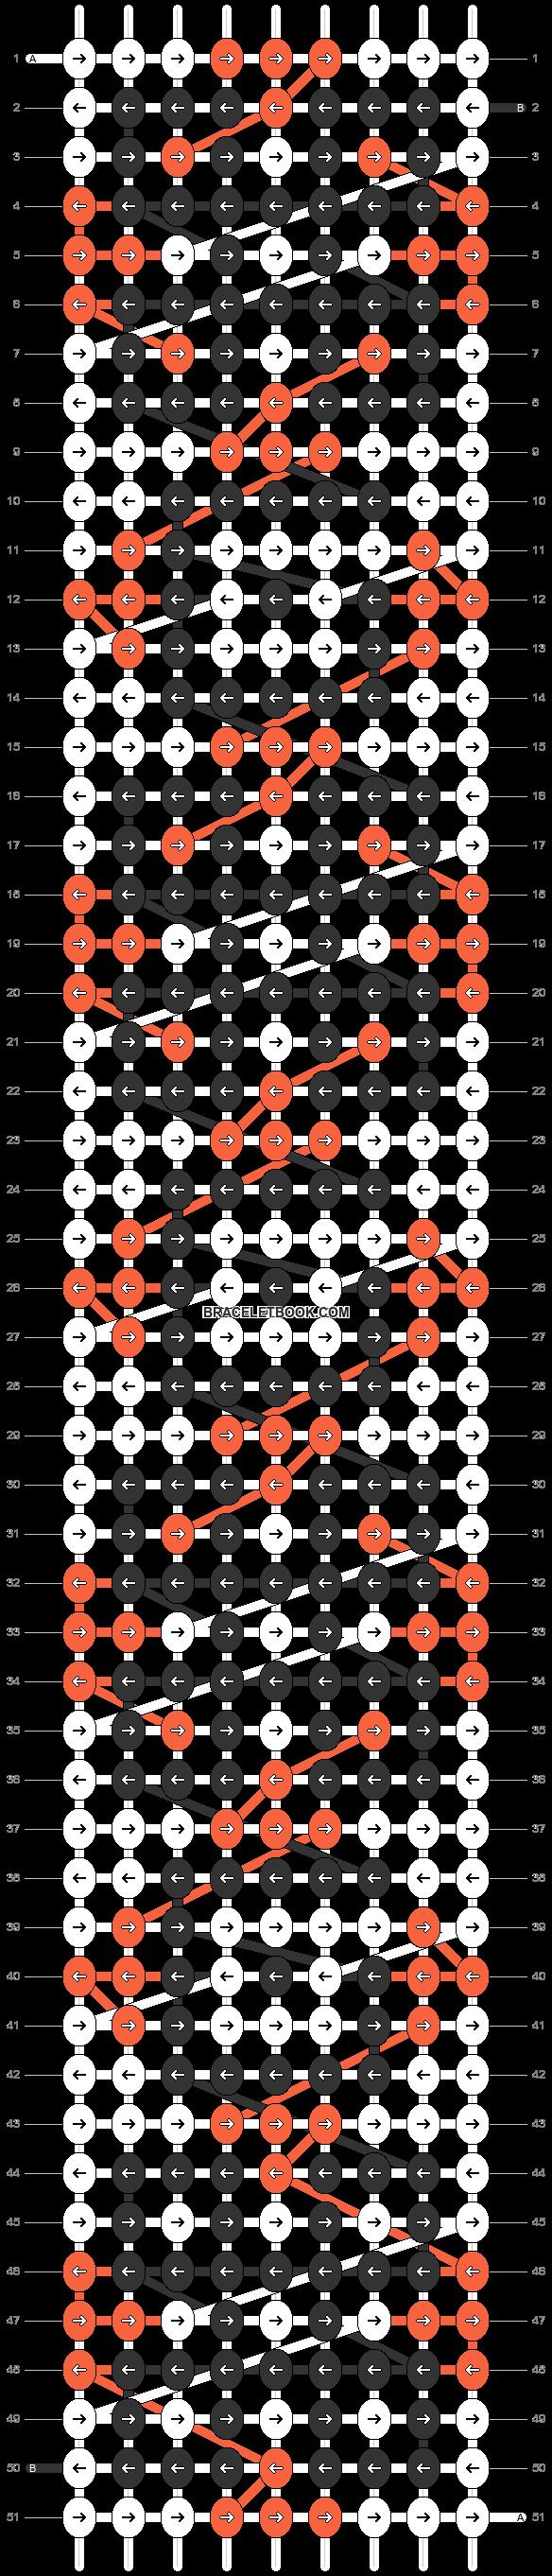 Alpha pattern #26322 pattern